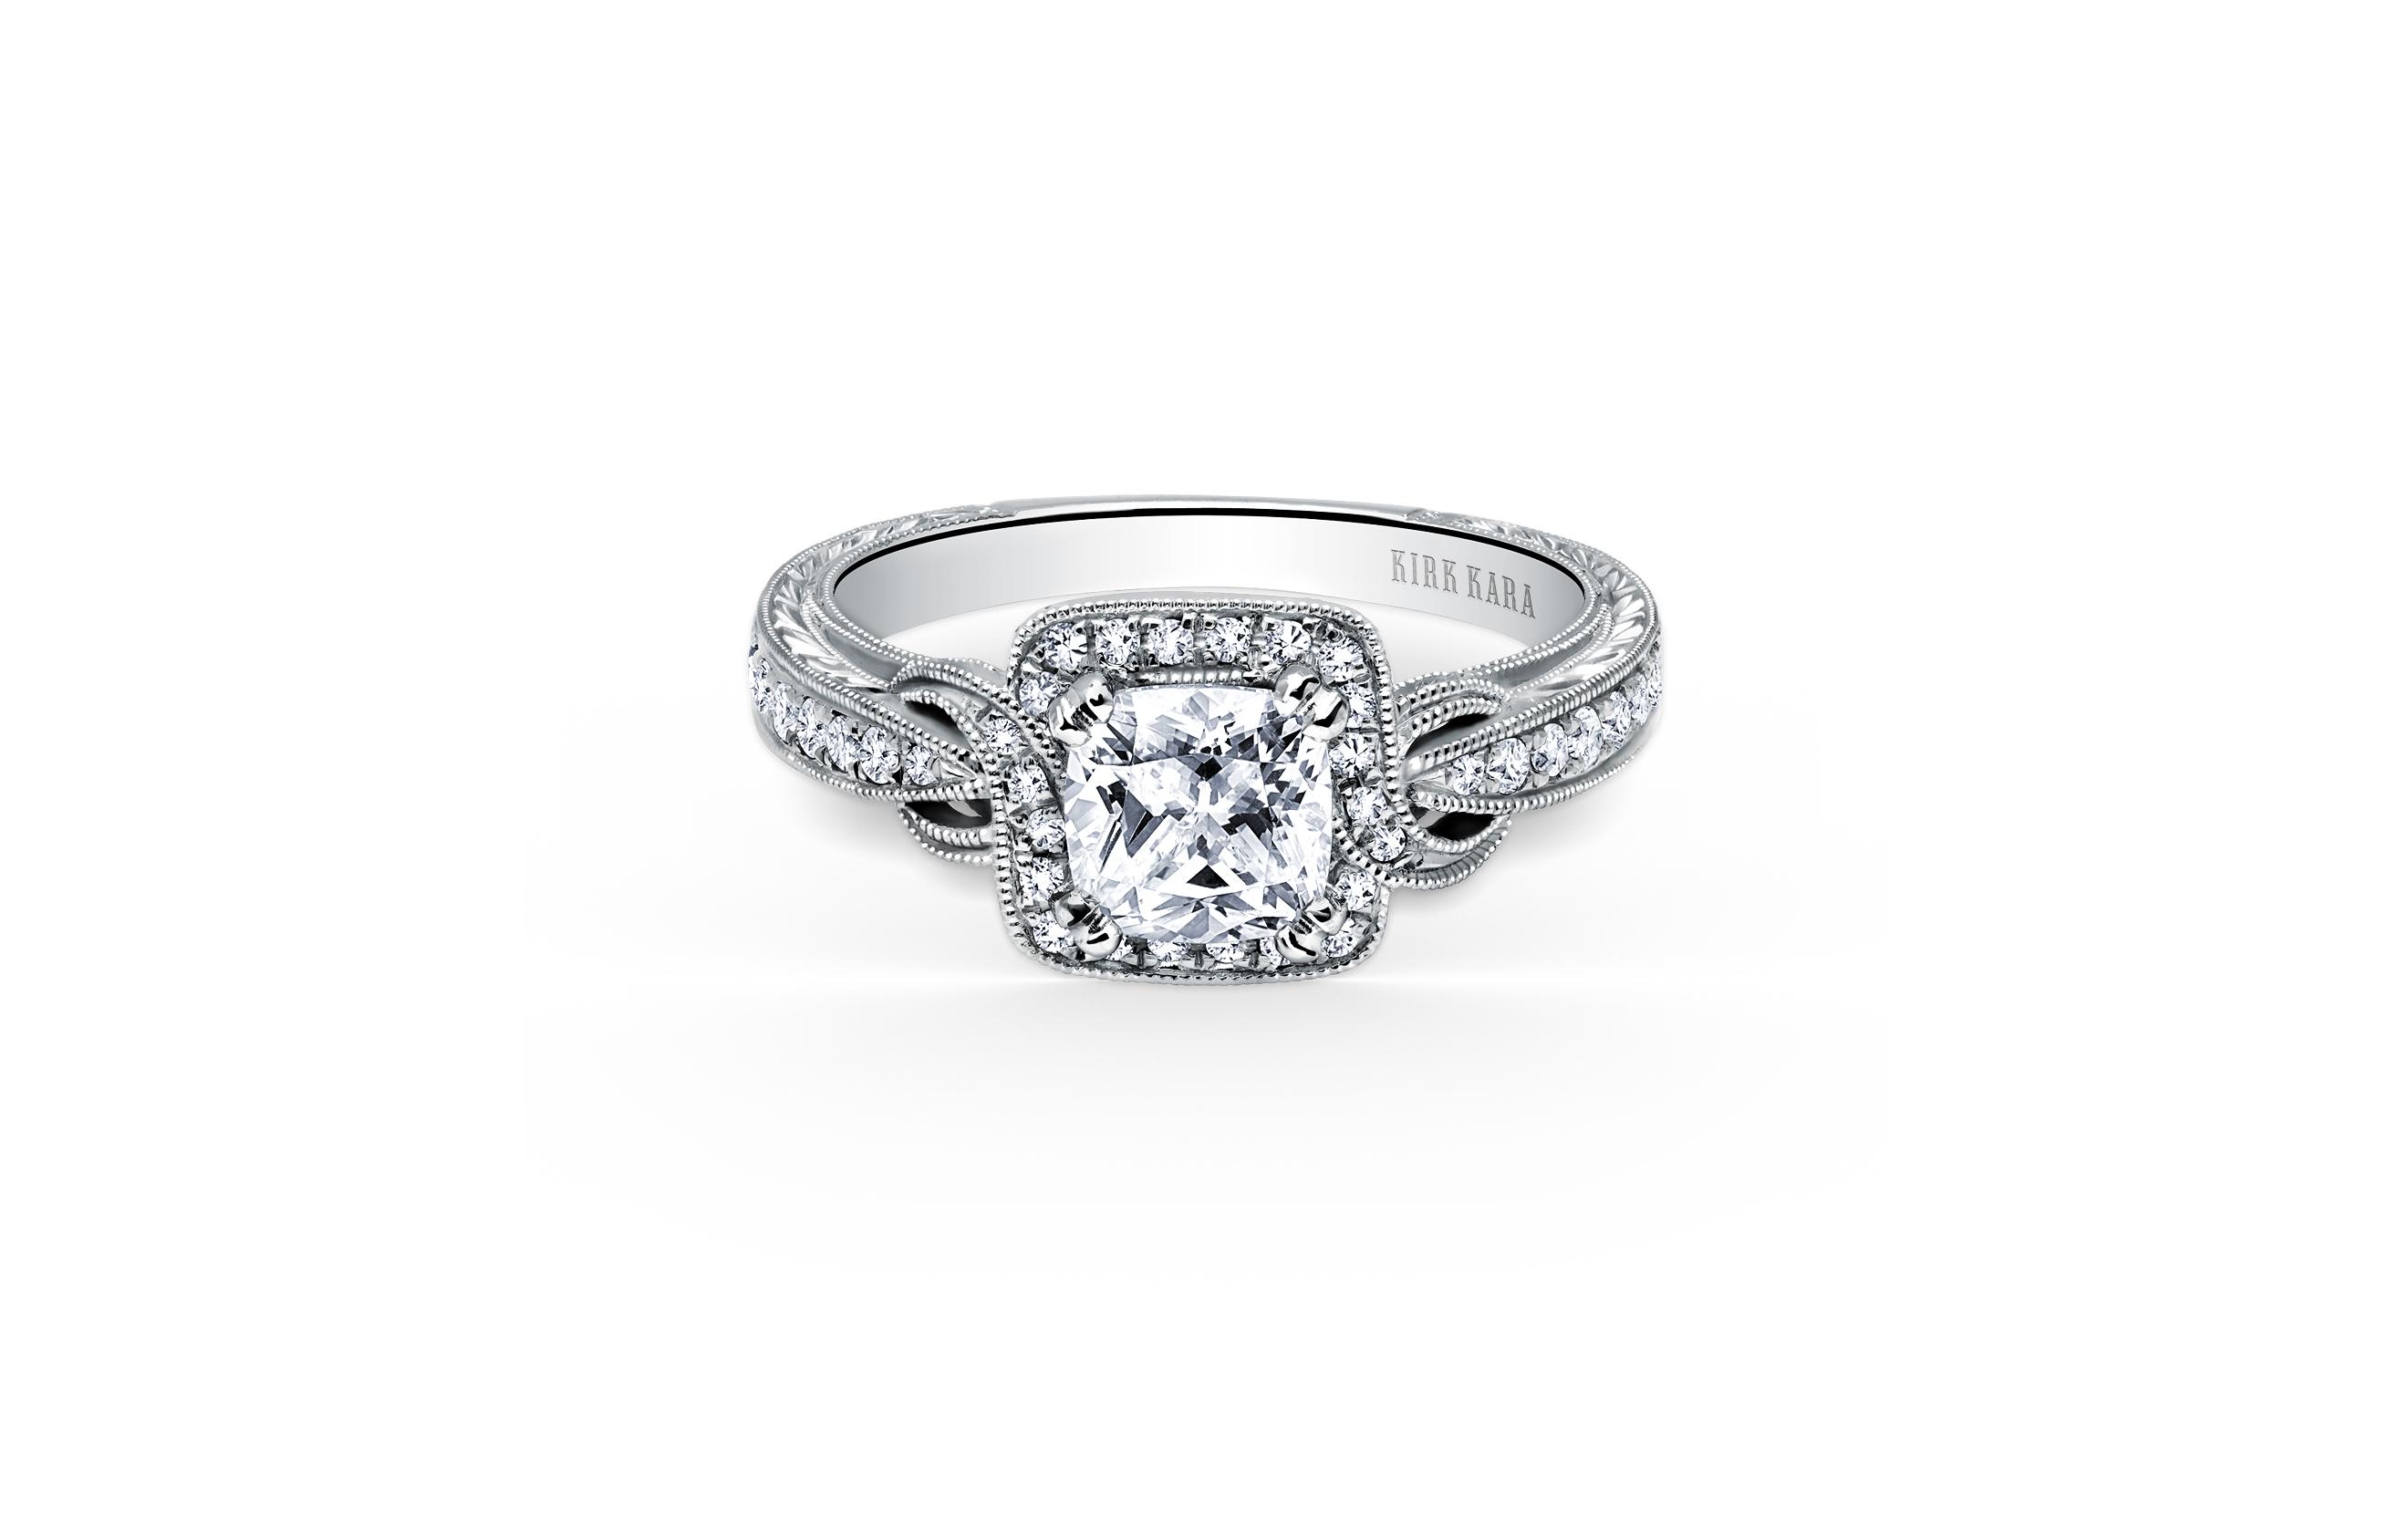 kirk kara cushion cut diamond engagement ring pirouette style